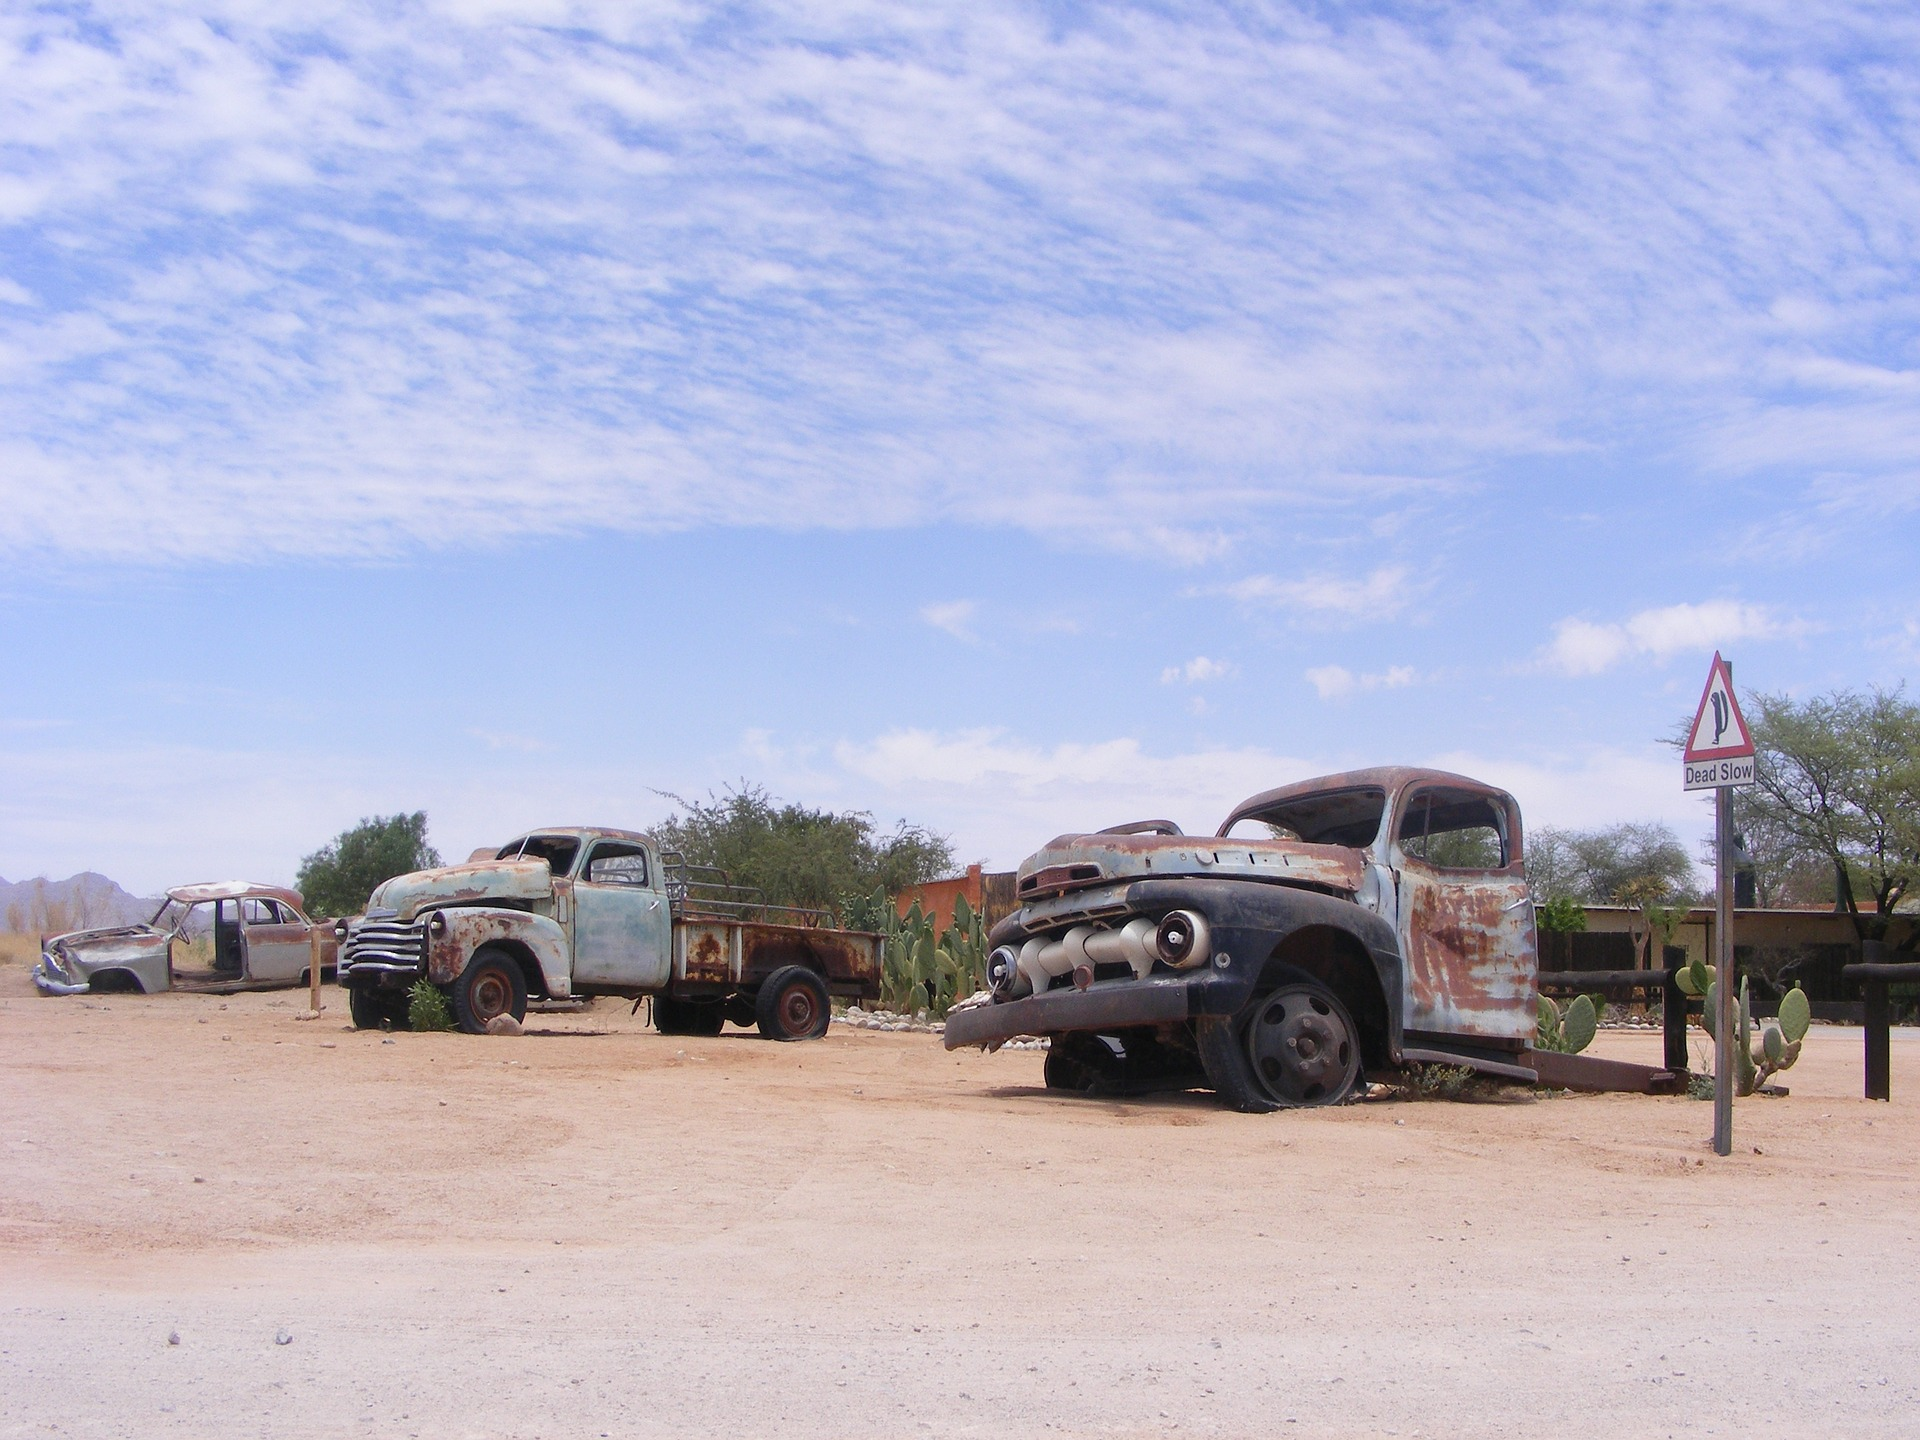 Cash for Junk cars no title near Revere MA